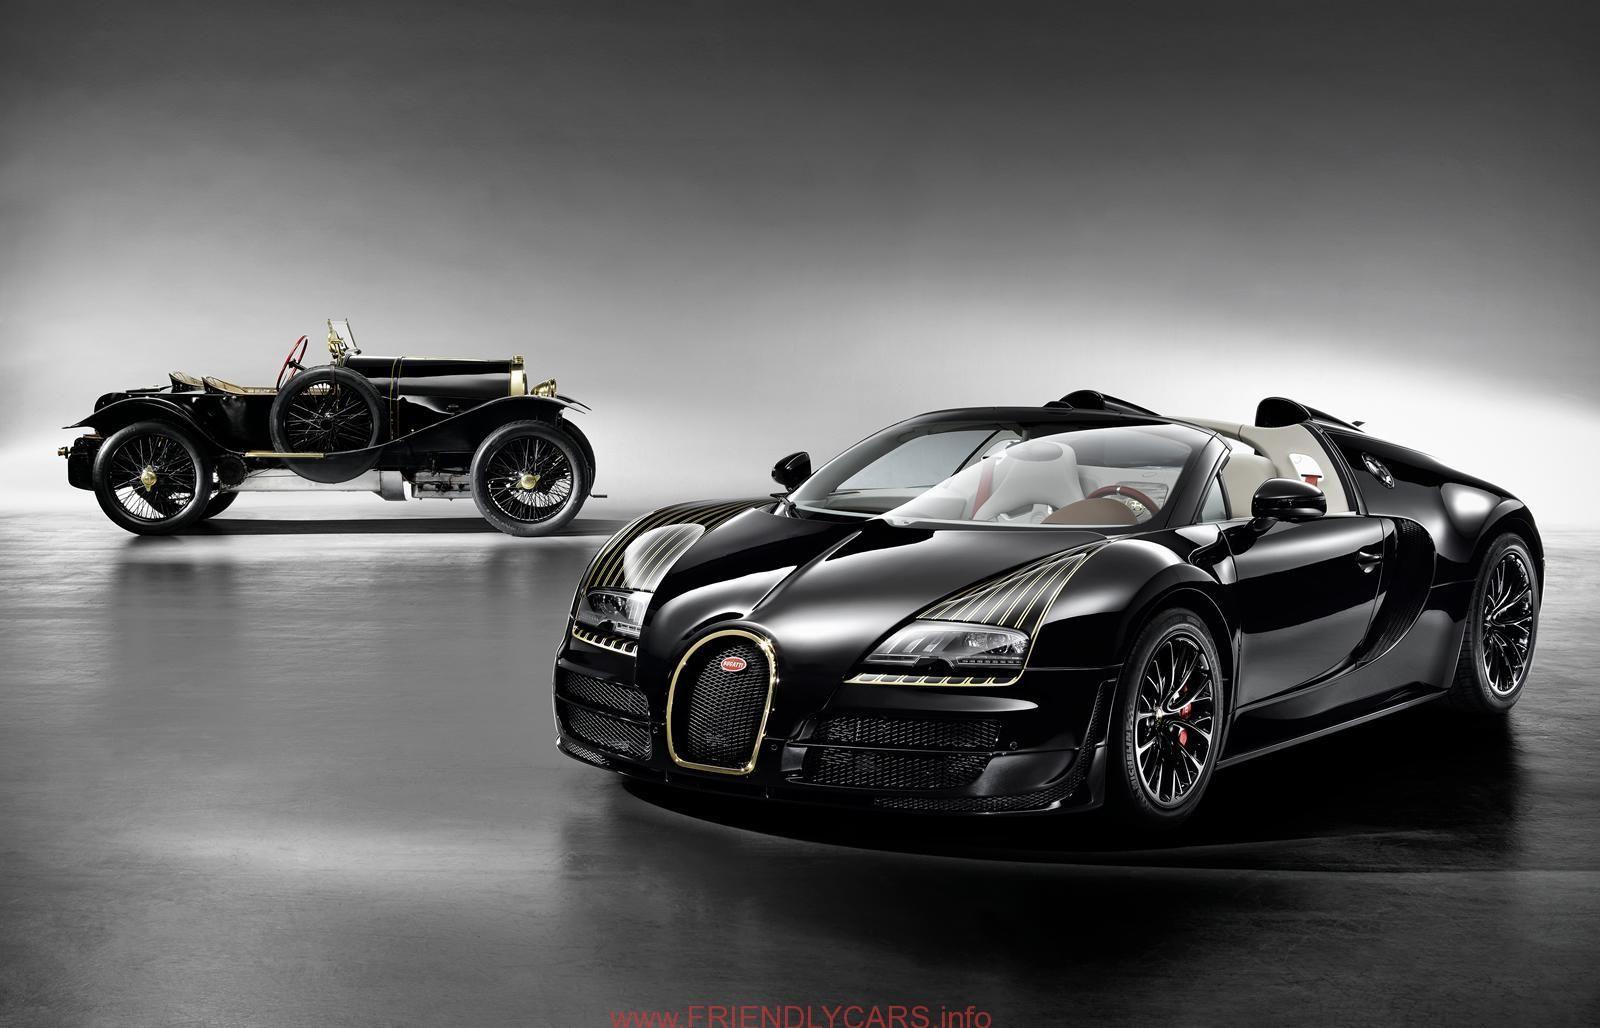 Black Bugatti Veyron 16 4 Grand Sport Image Hd Alifiah Sites Bugatti Veyron Grand Sport Vitesse Bugatti Veyron Bugatti Veyron Vitesse